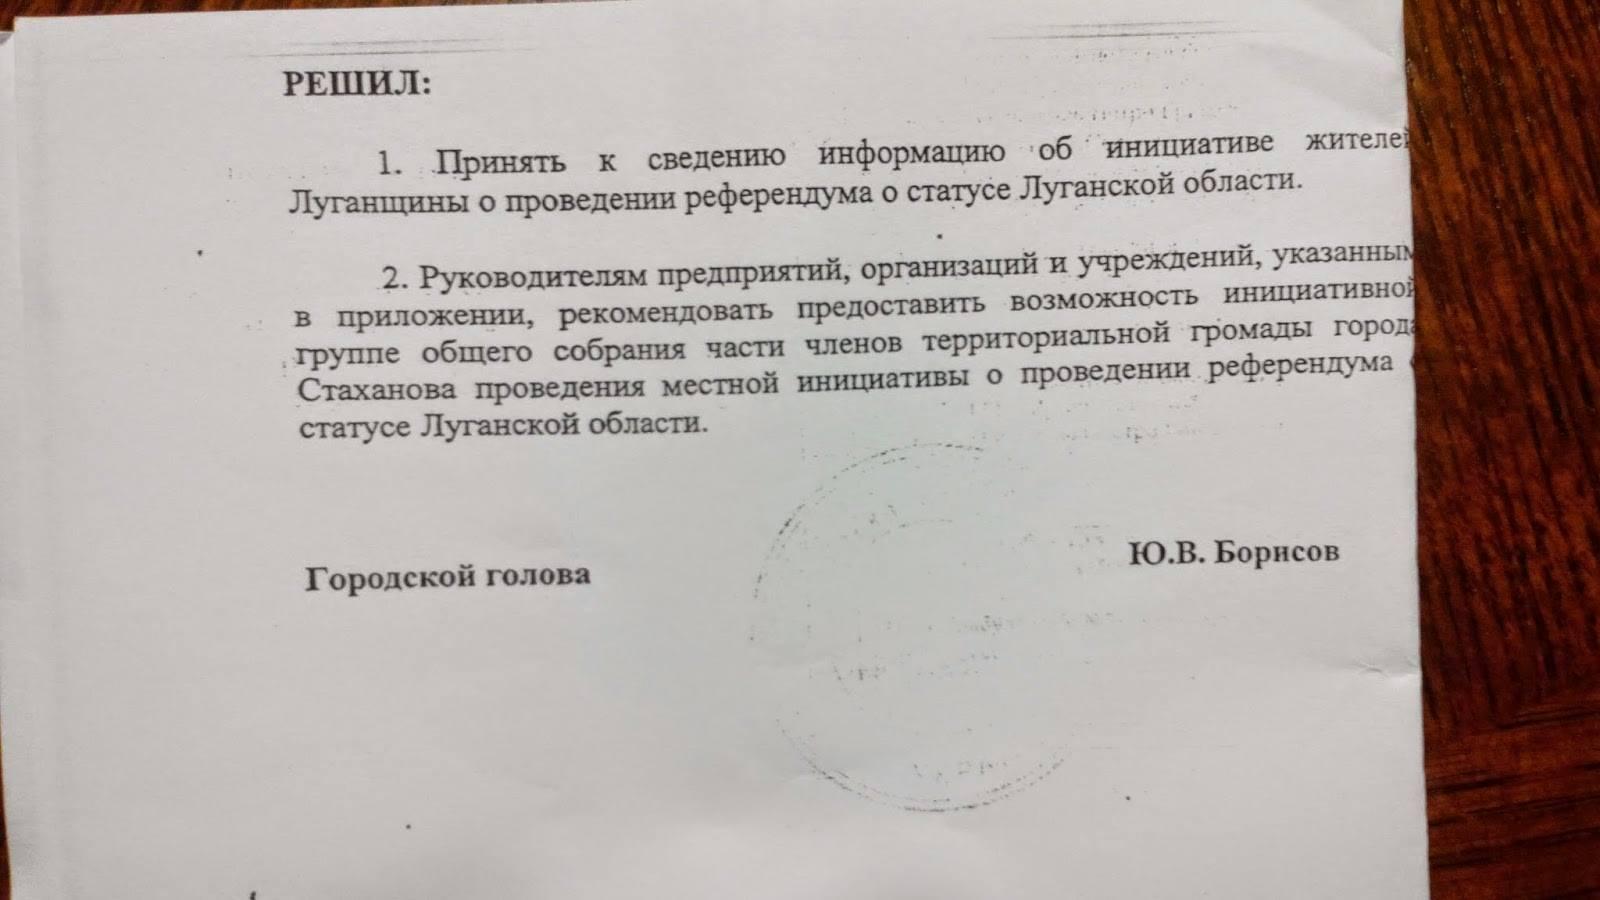 Суд оправдал экс-мэра Стаханова, сепаратиста Юрия Борисова